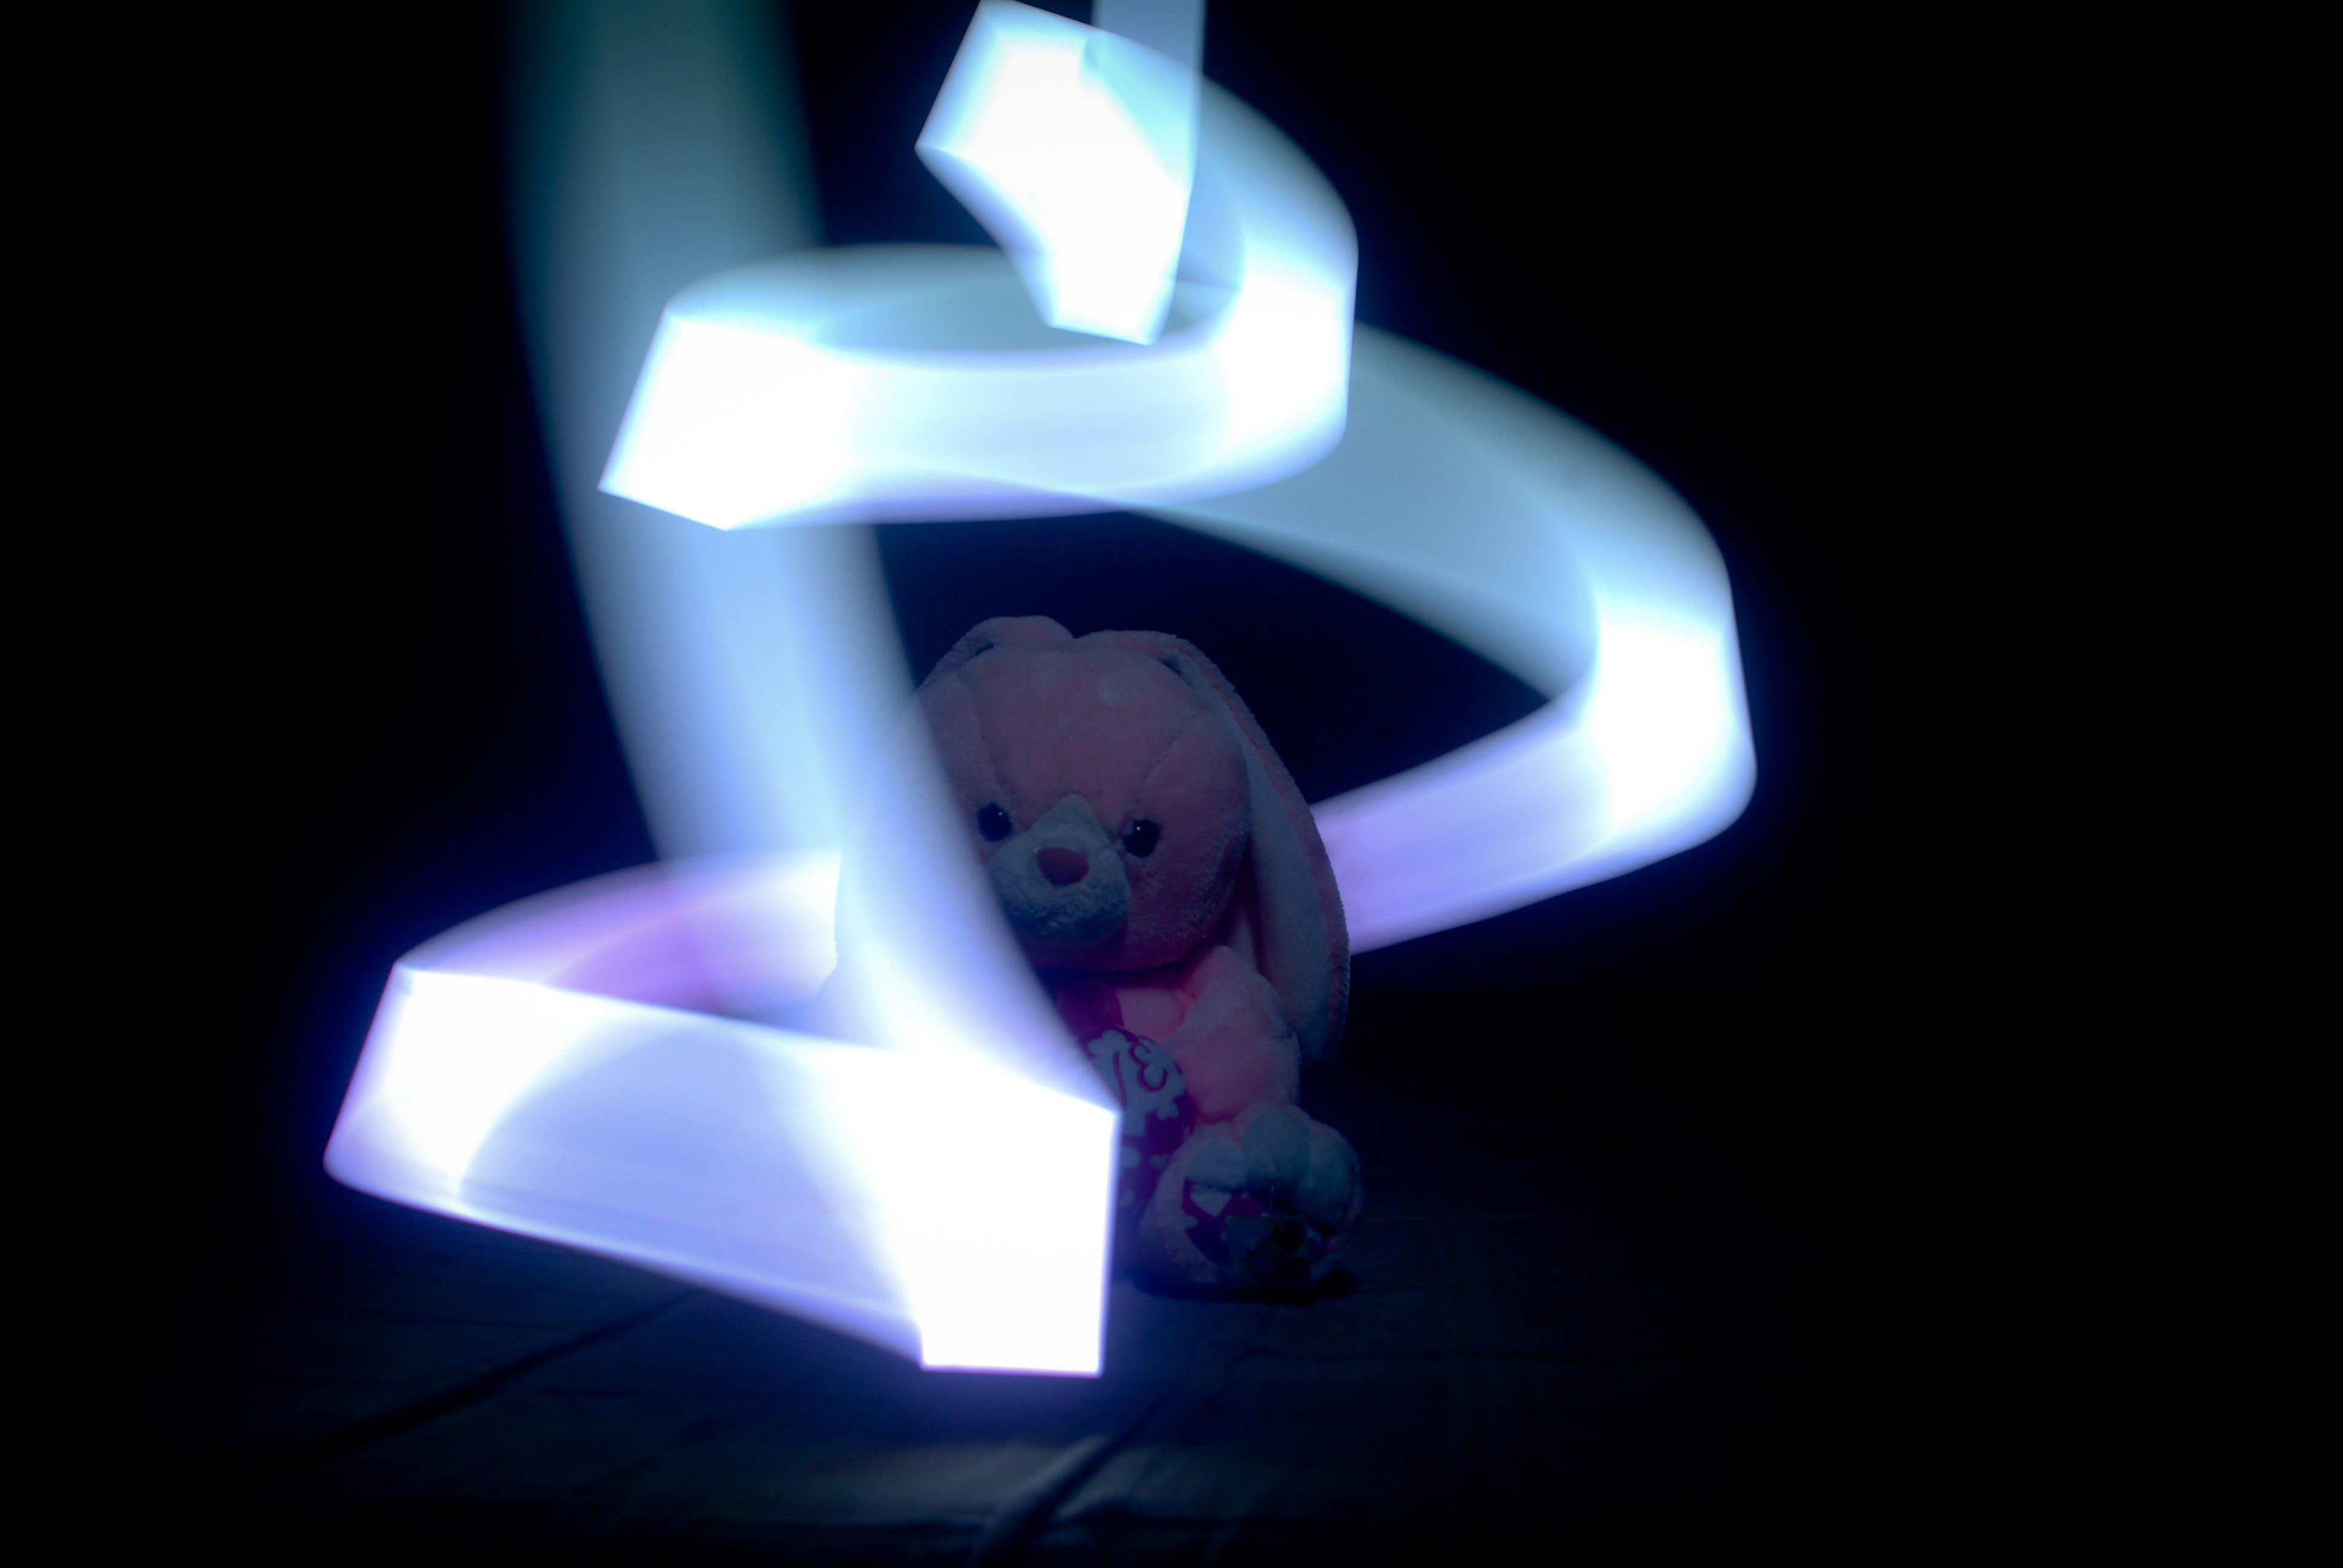 Pink and White Rabbit Plush Toy